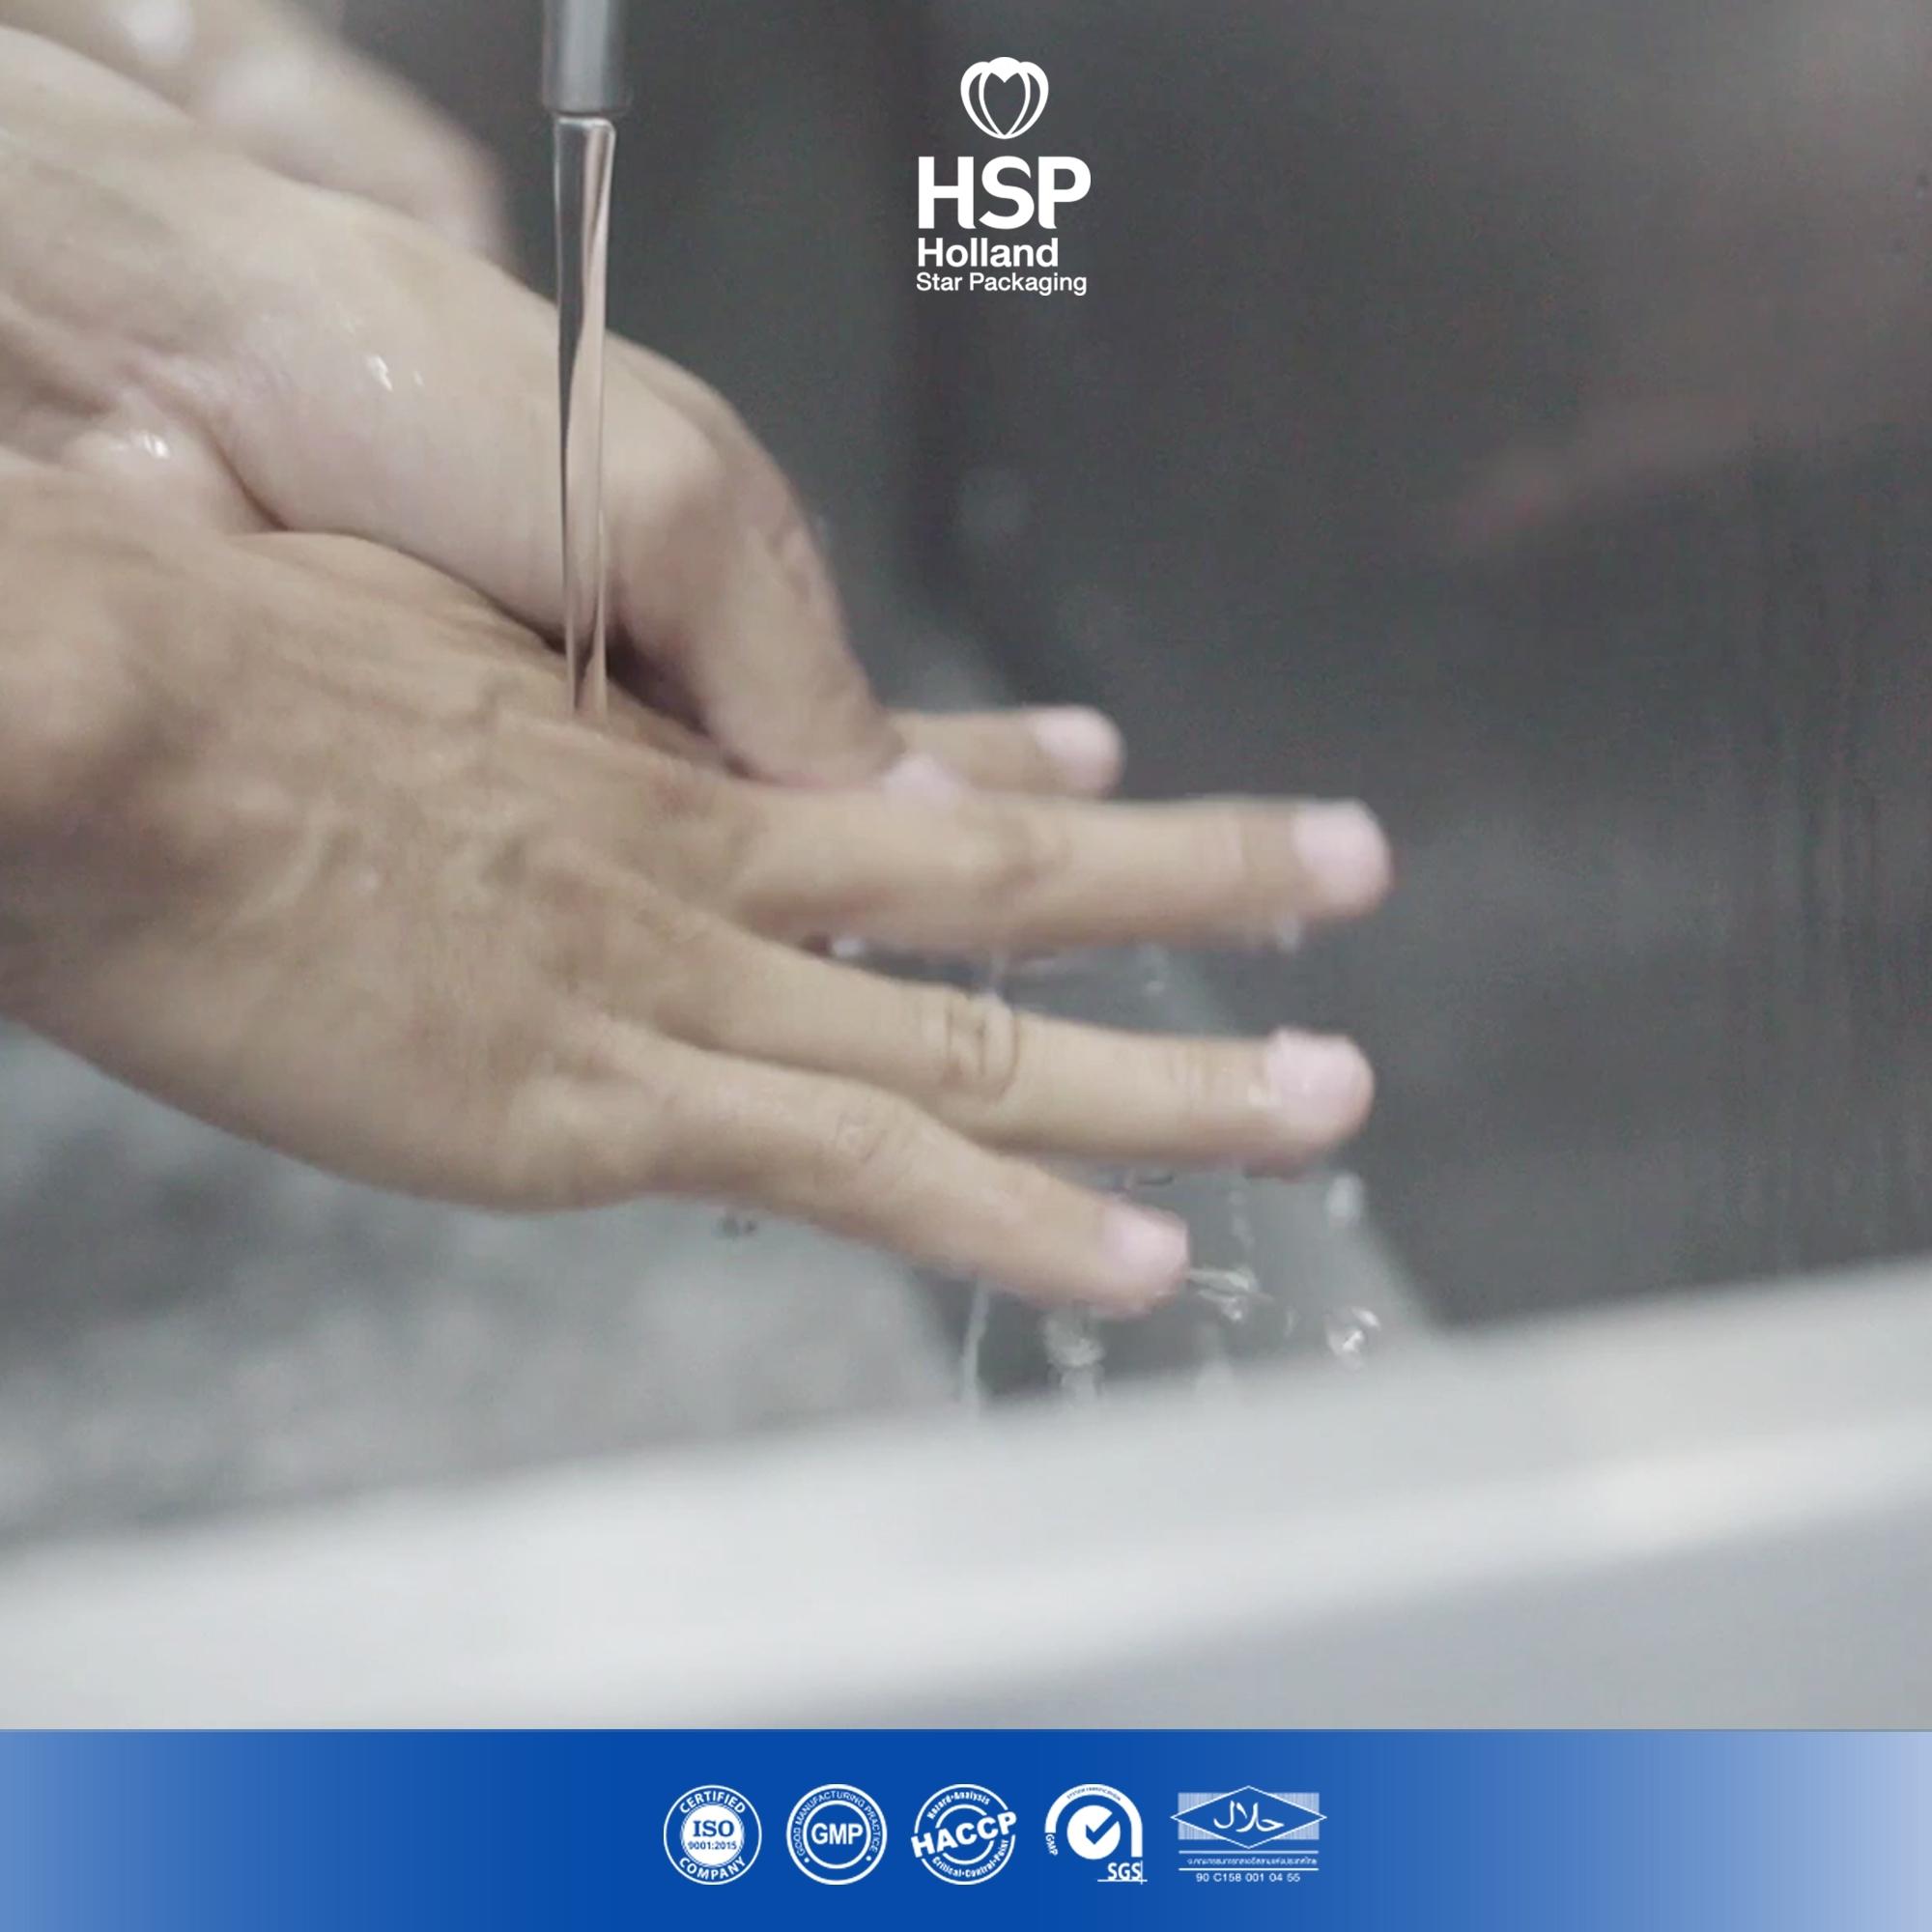 Ads-HSP_๑๙๐๕๒๗_0014